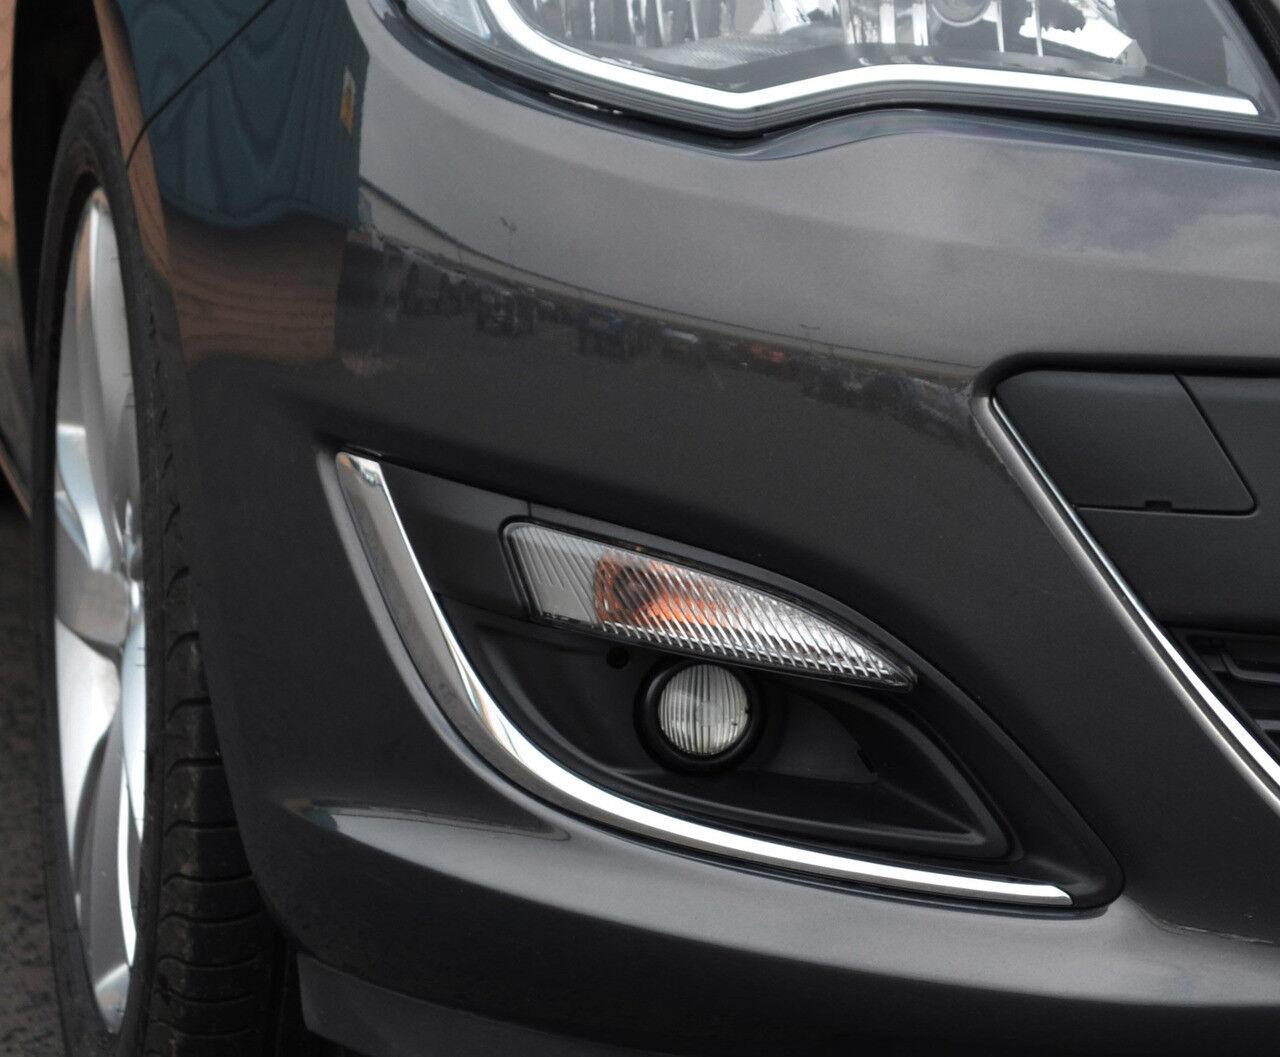 Chrome Fog Light Lamp Trim Covers Set To Fit Vauxhall Opel Astra J 2012 16 Ebay